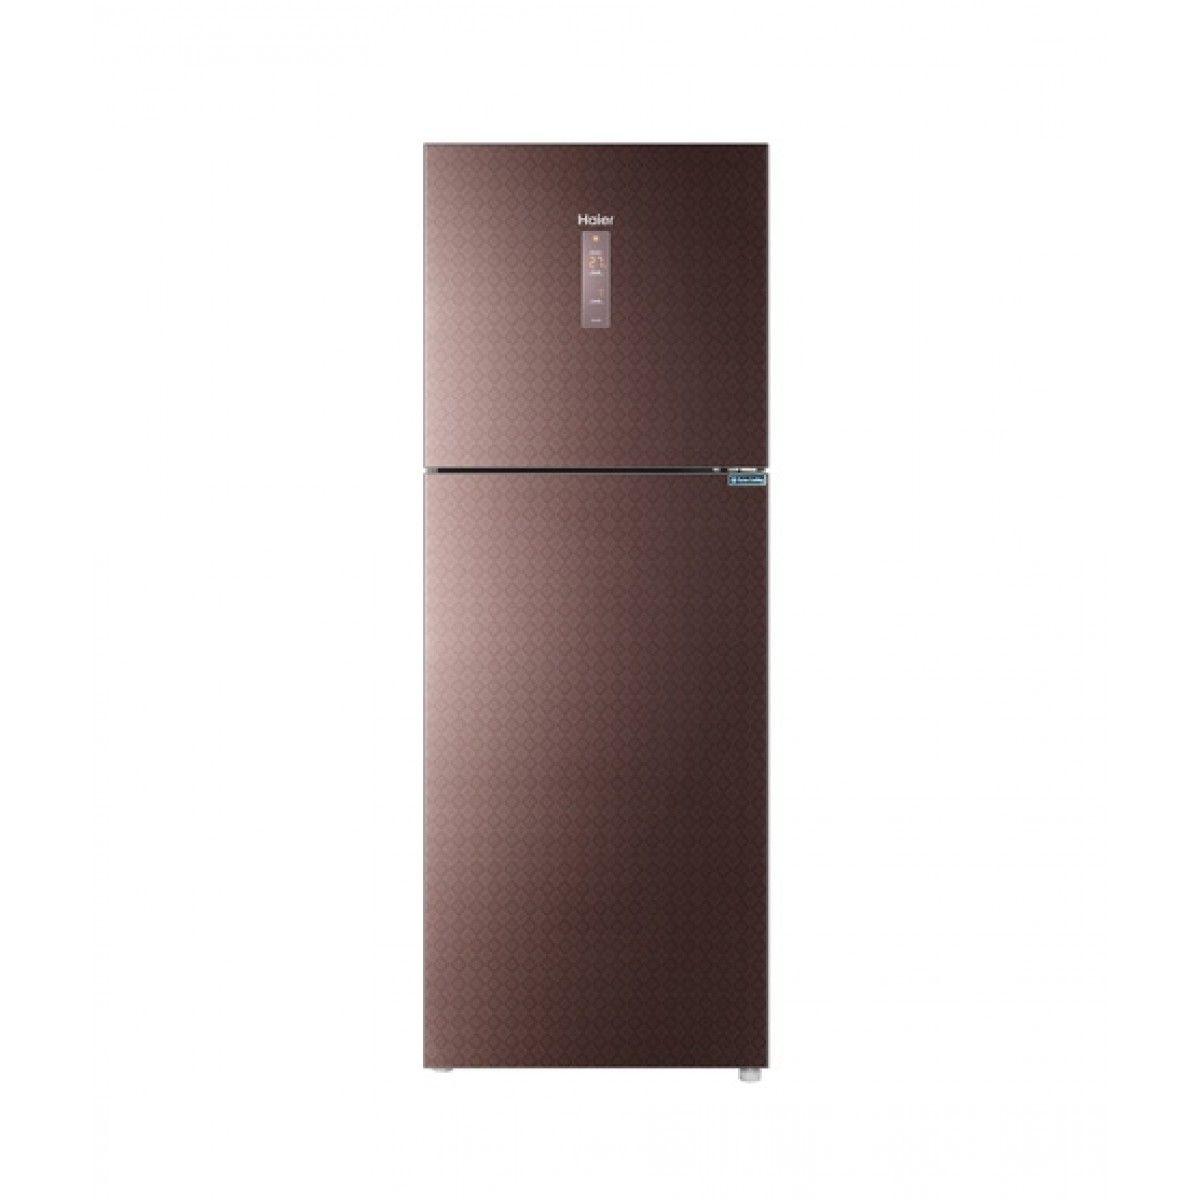 Haier HRF-336TDC 11 Cu Ft Turbo Cooling Freezer-on-Top Refrigerator